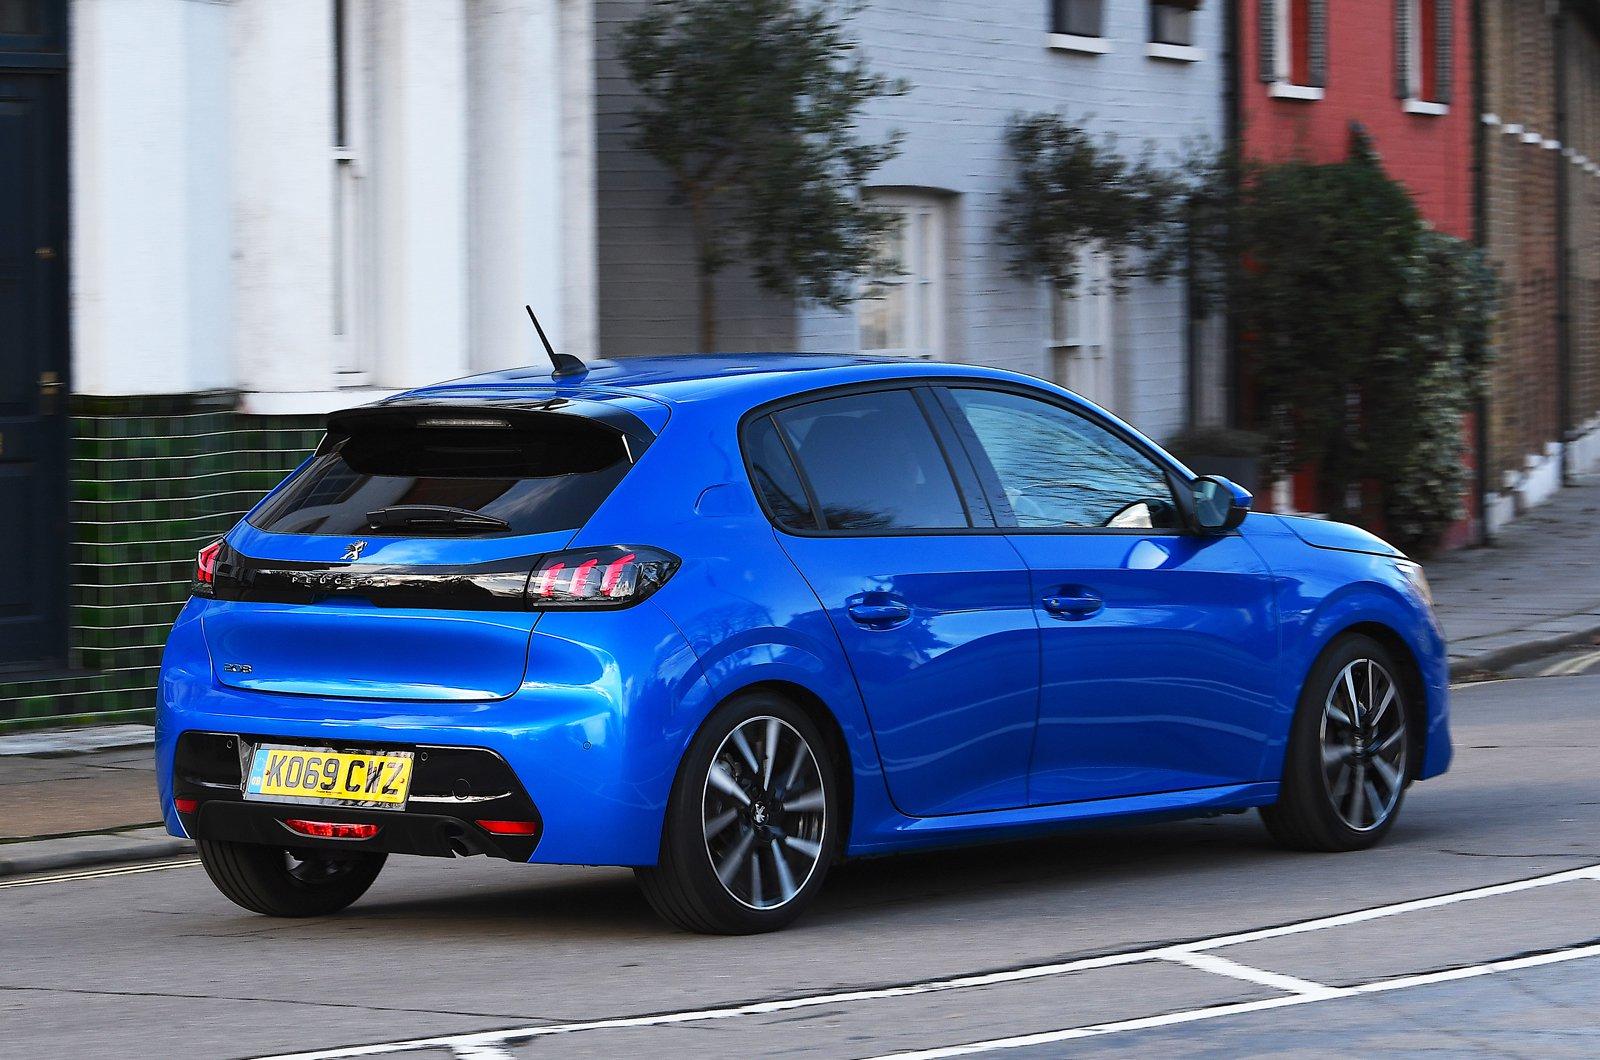 Peugeot 208 rear - blue 69-plate car